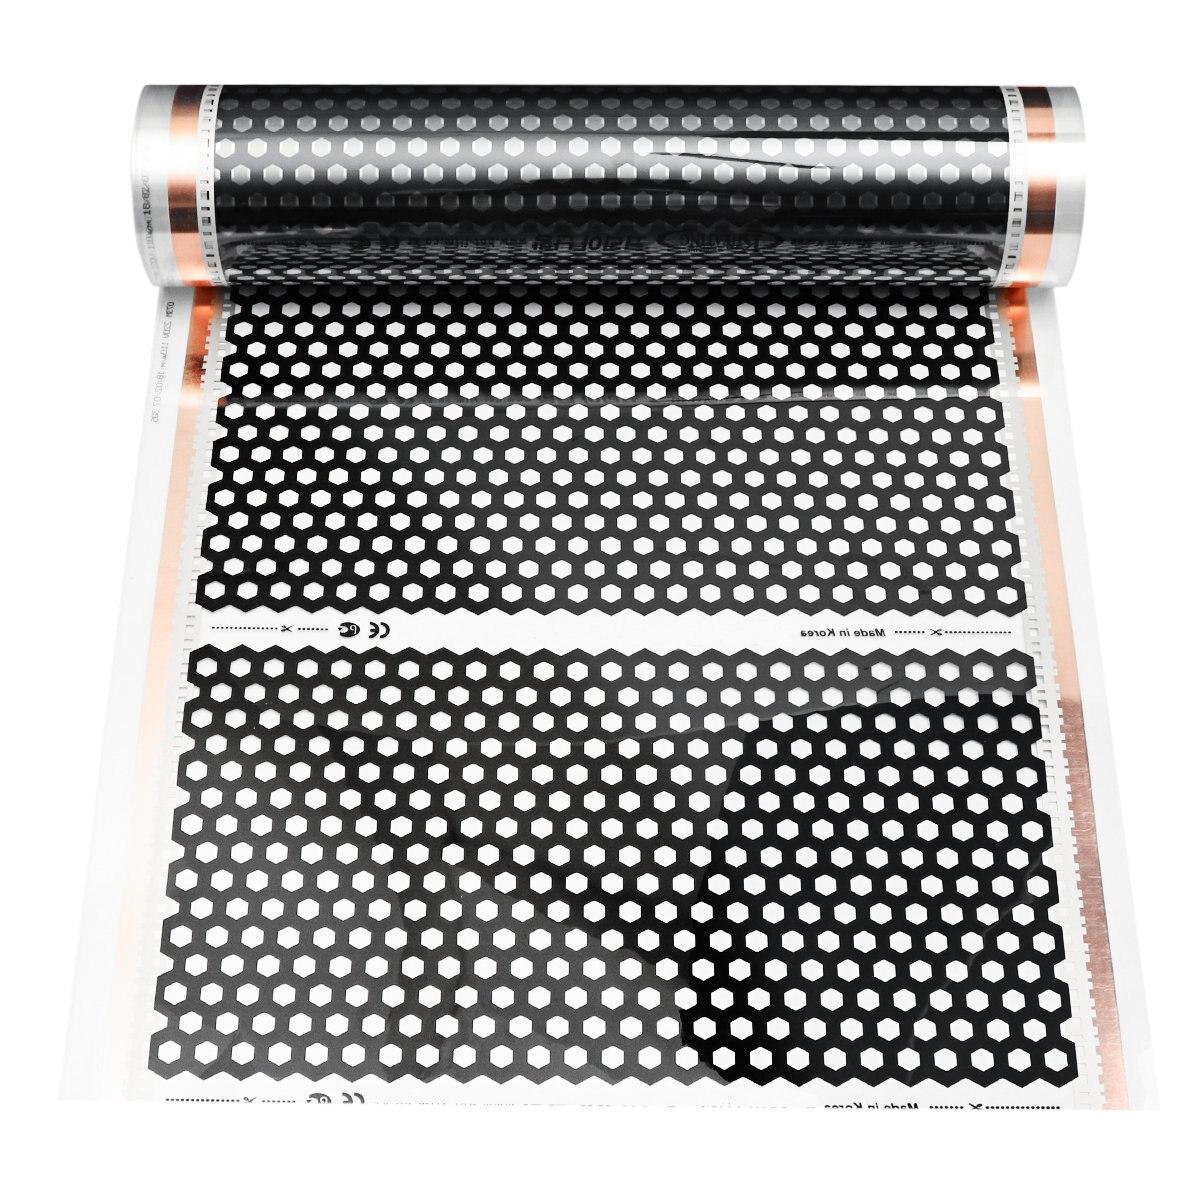 50CM*2M Infrared Warm Floor Heating Film 220w Electric High Quality Carbon Fiber Electric Heating Mat Underfloor Heating Film